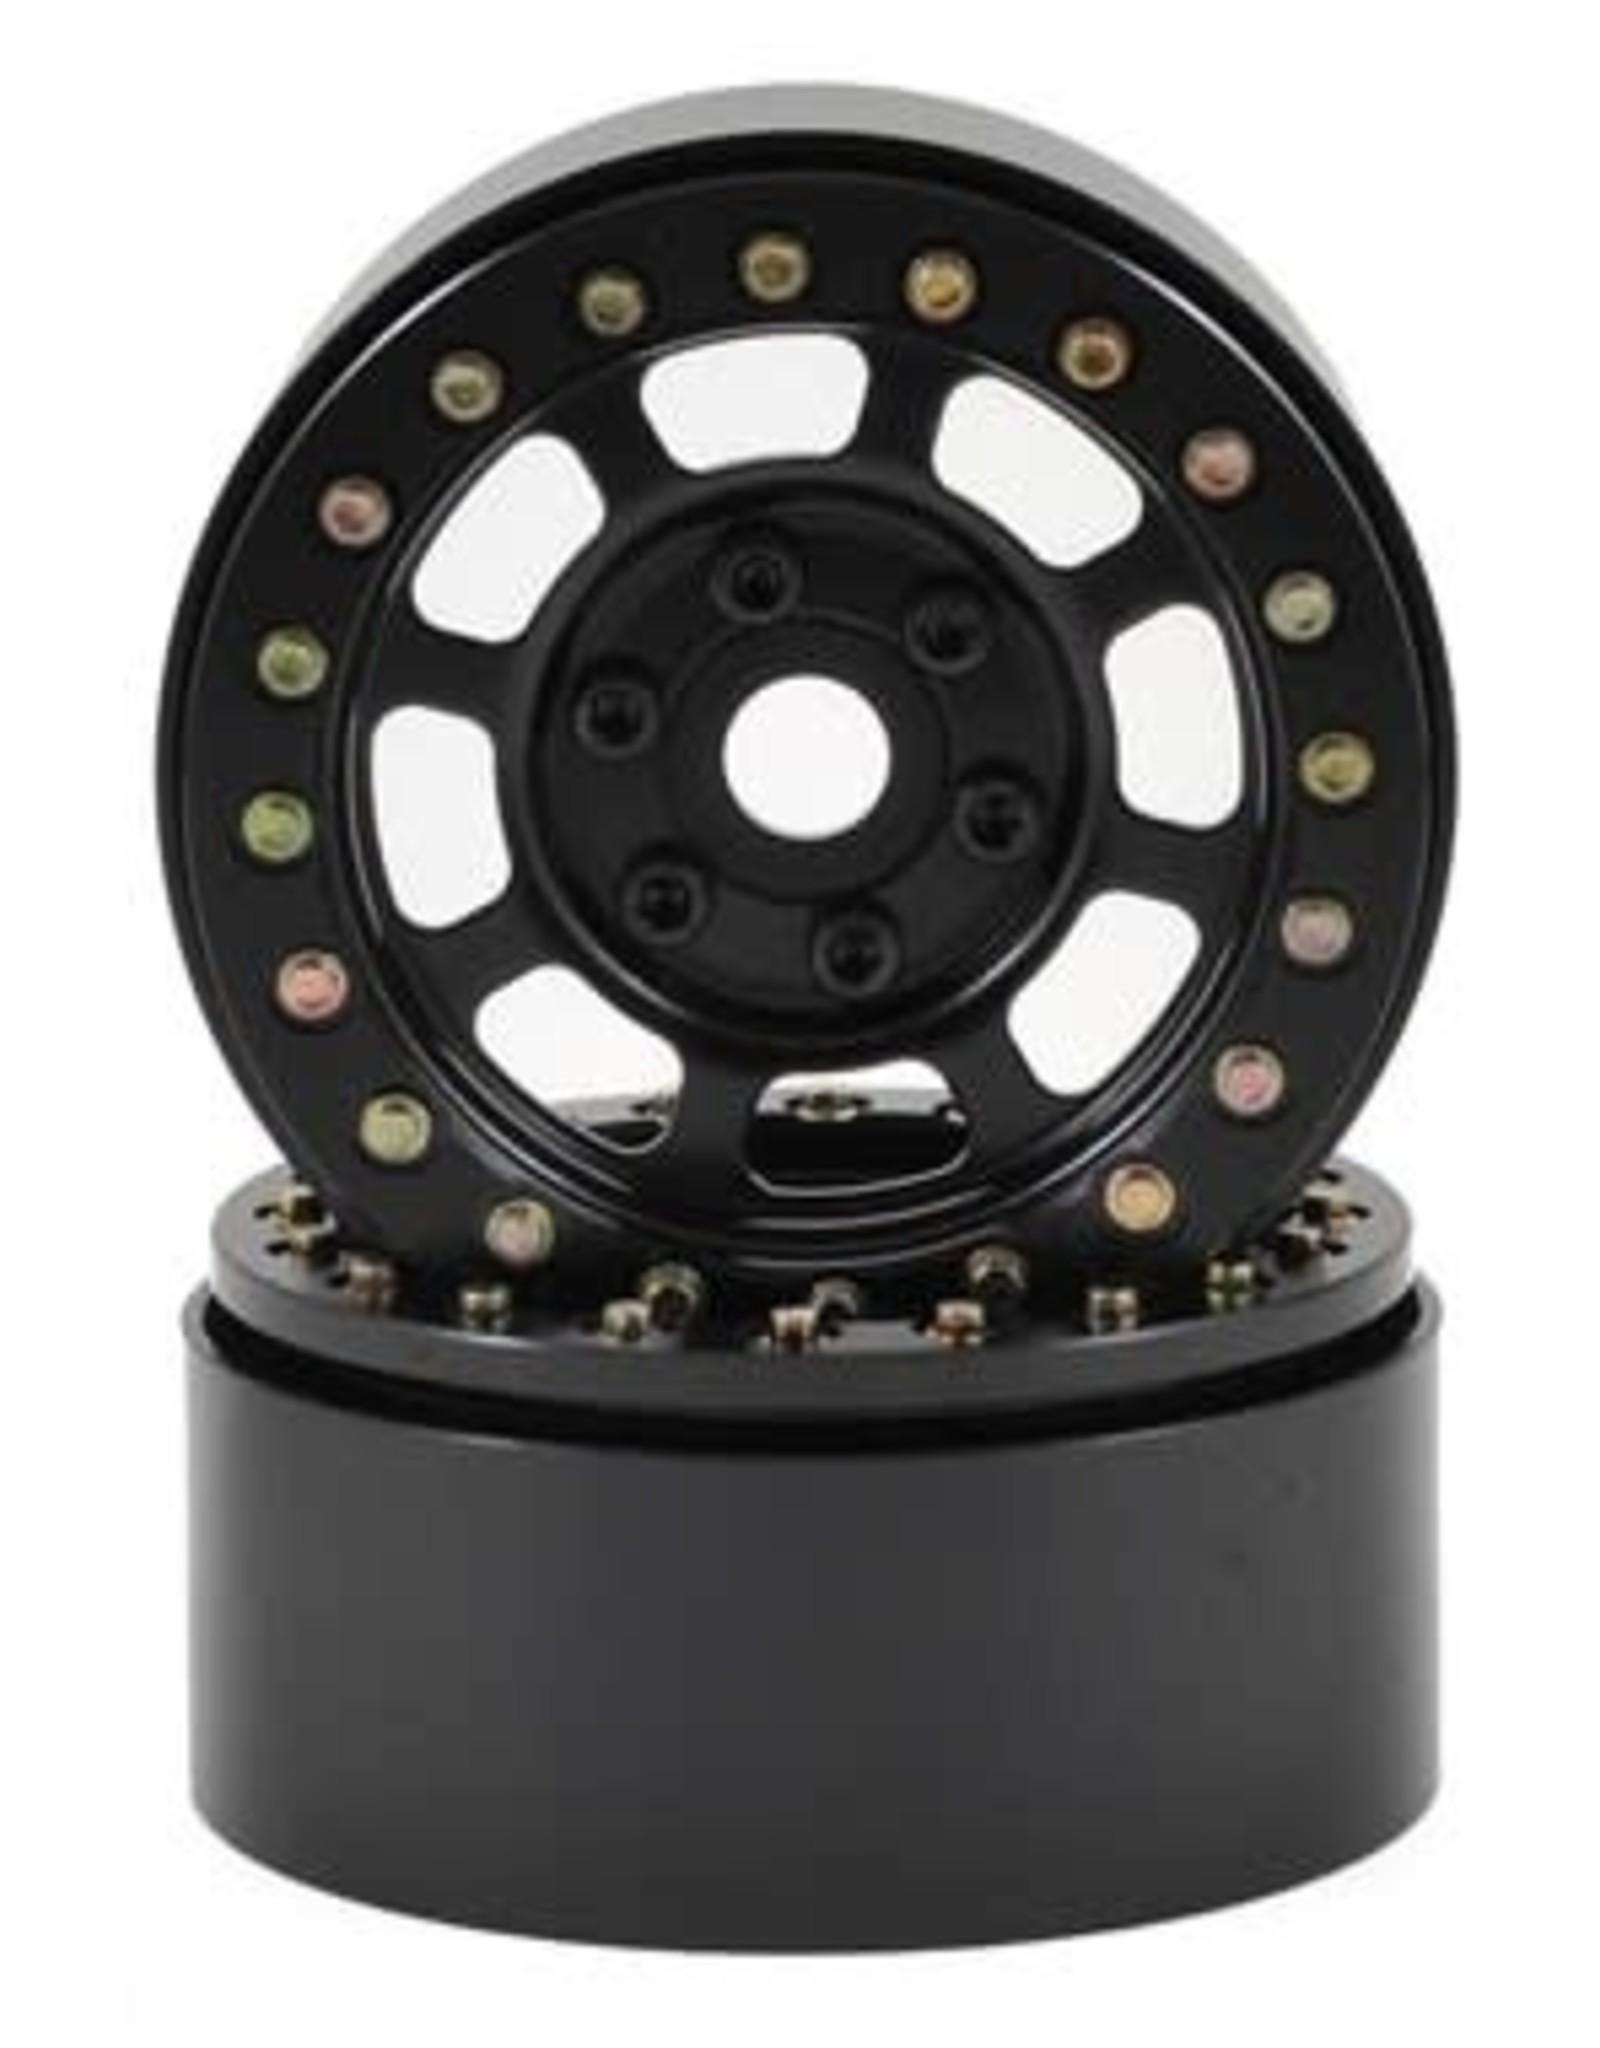 "SSD SSD RC Trail 1.9"" Steel Beadlock Crawler Wheels (Black) (2)"